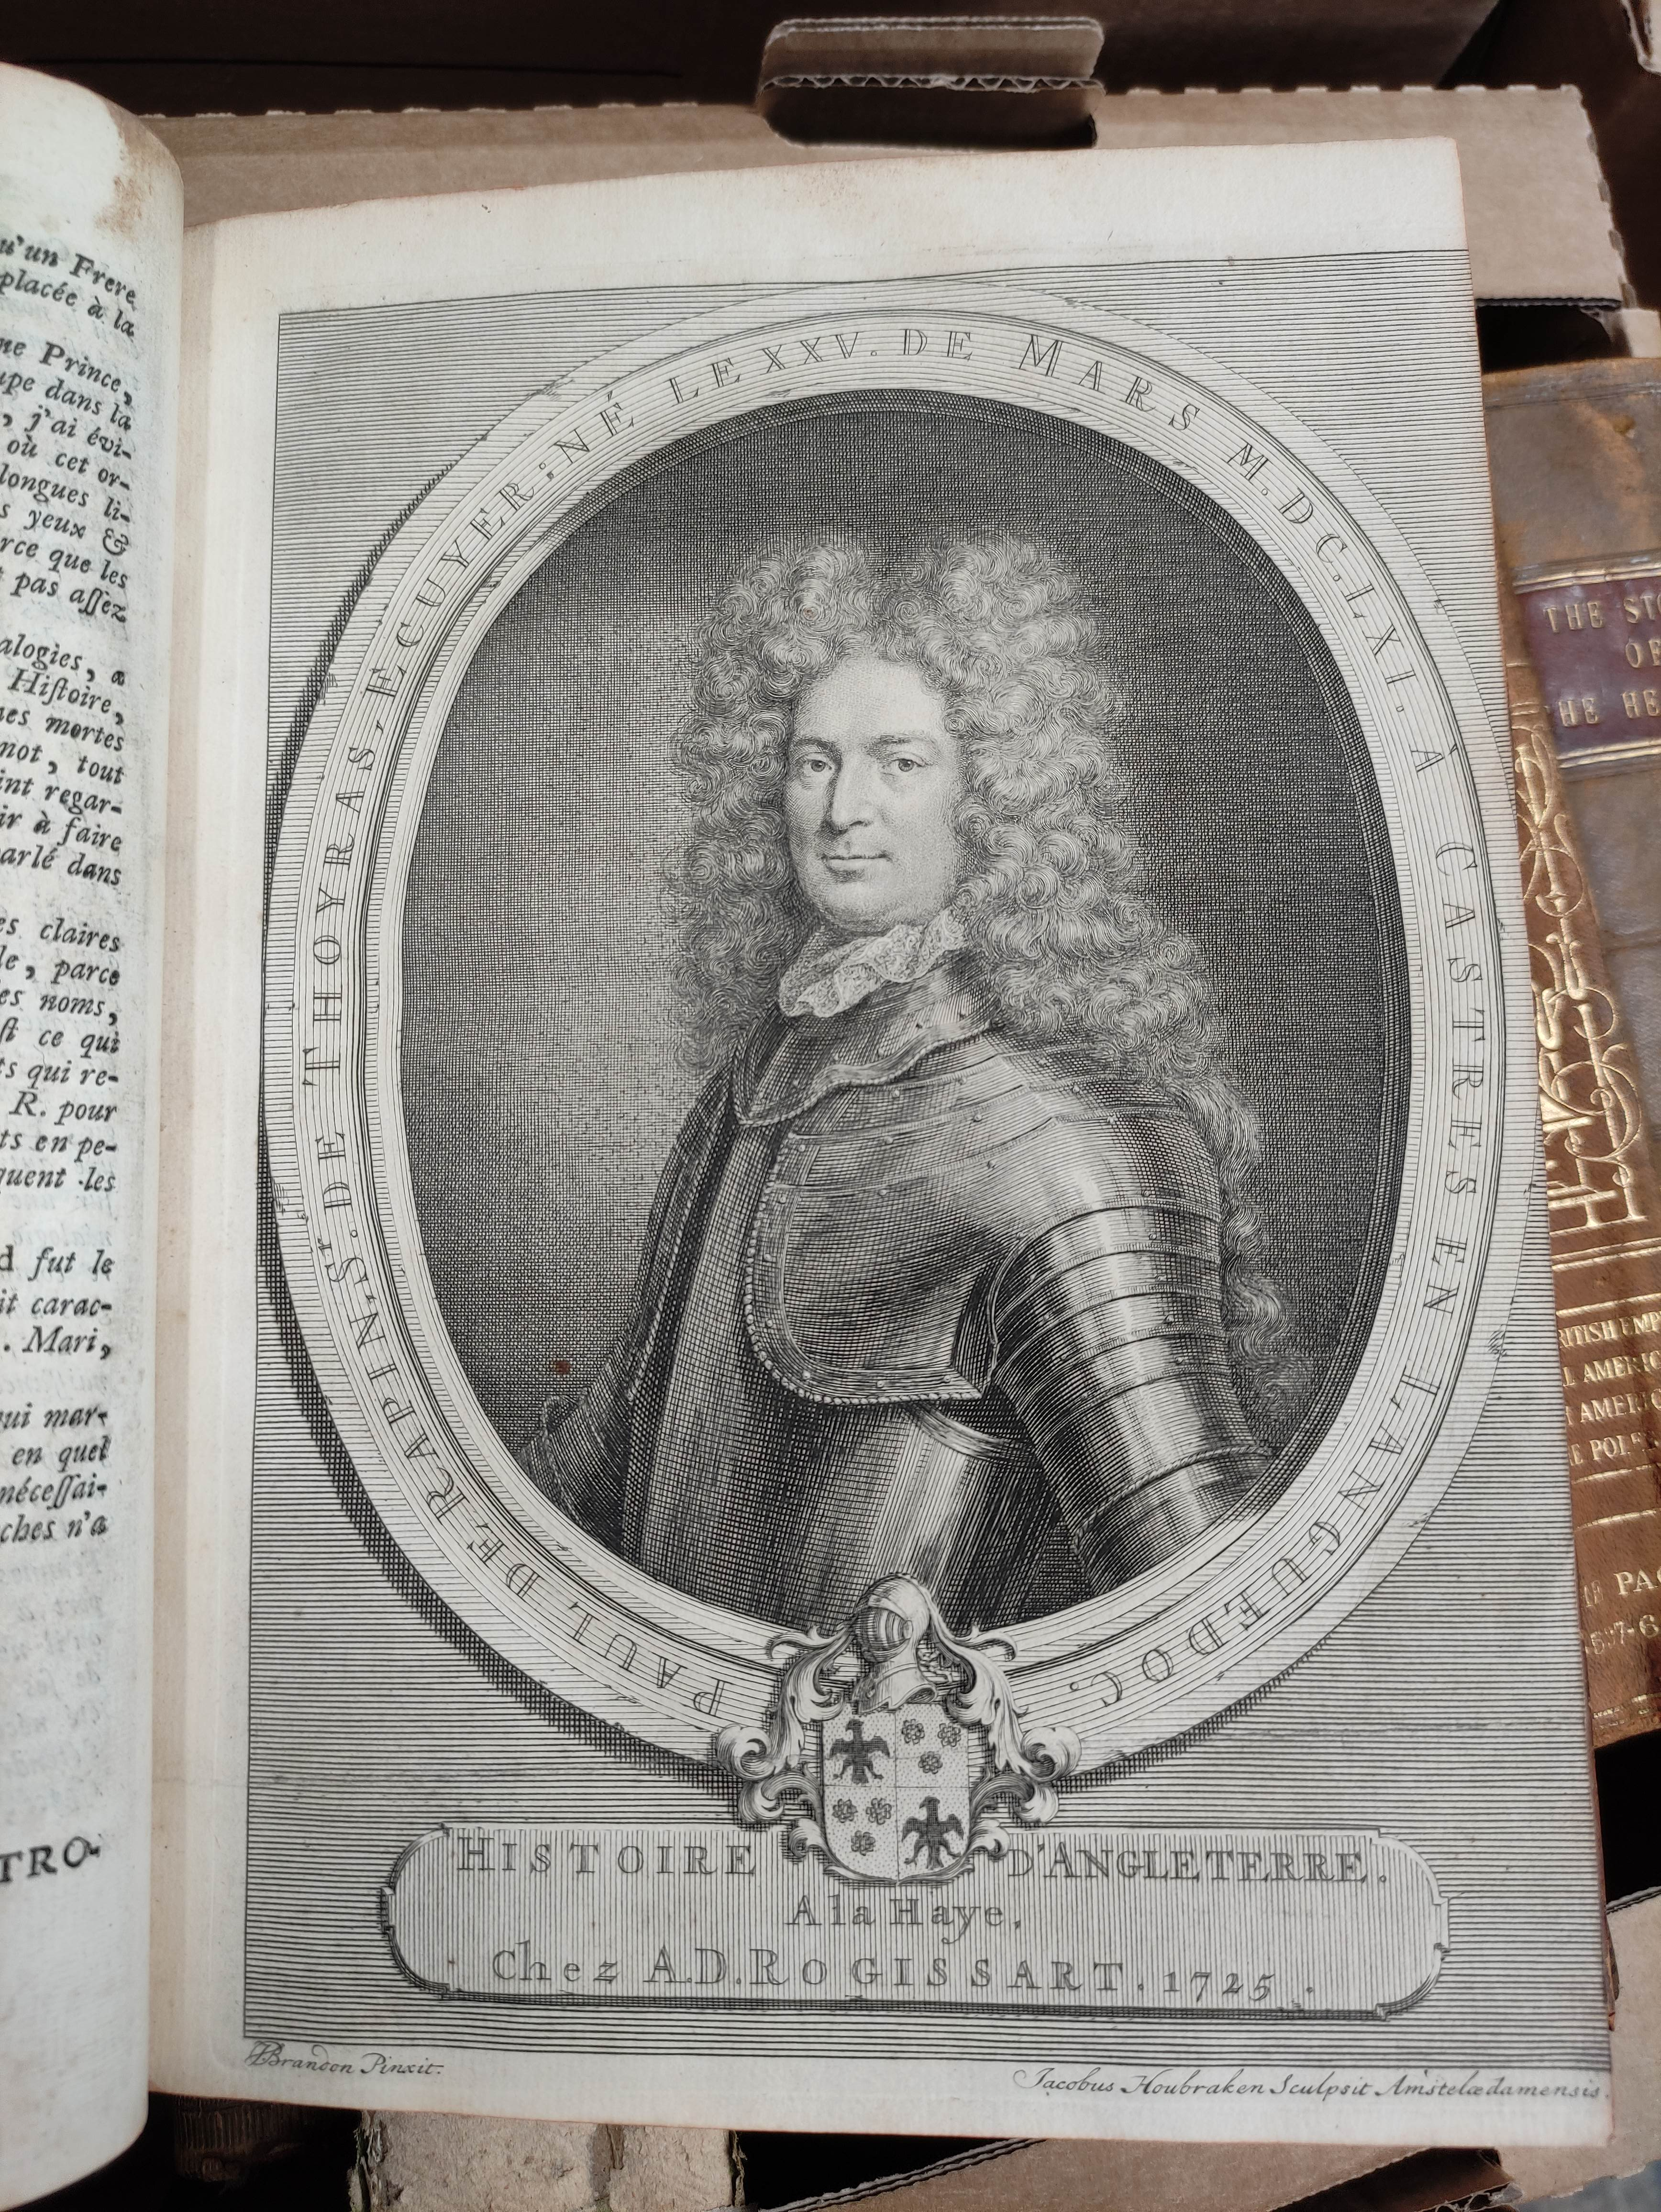 DE RAPIN THOYRAS.Histoire D'Angleterre. 10 vols. Eng. plates, fldg. tables, etc. Quarto. Calf. The - Image 6 of 8